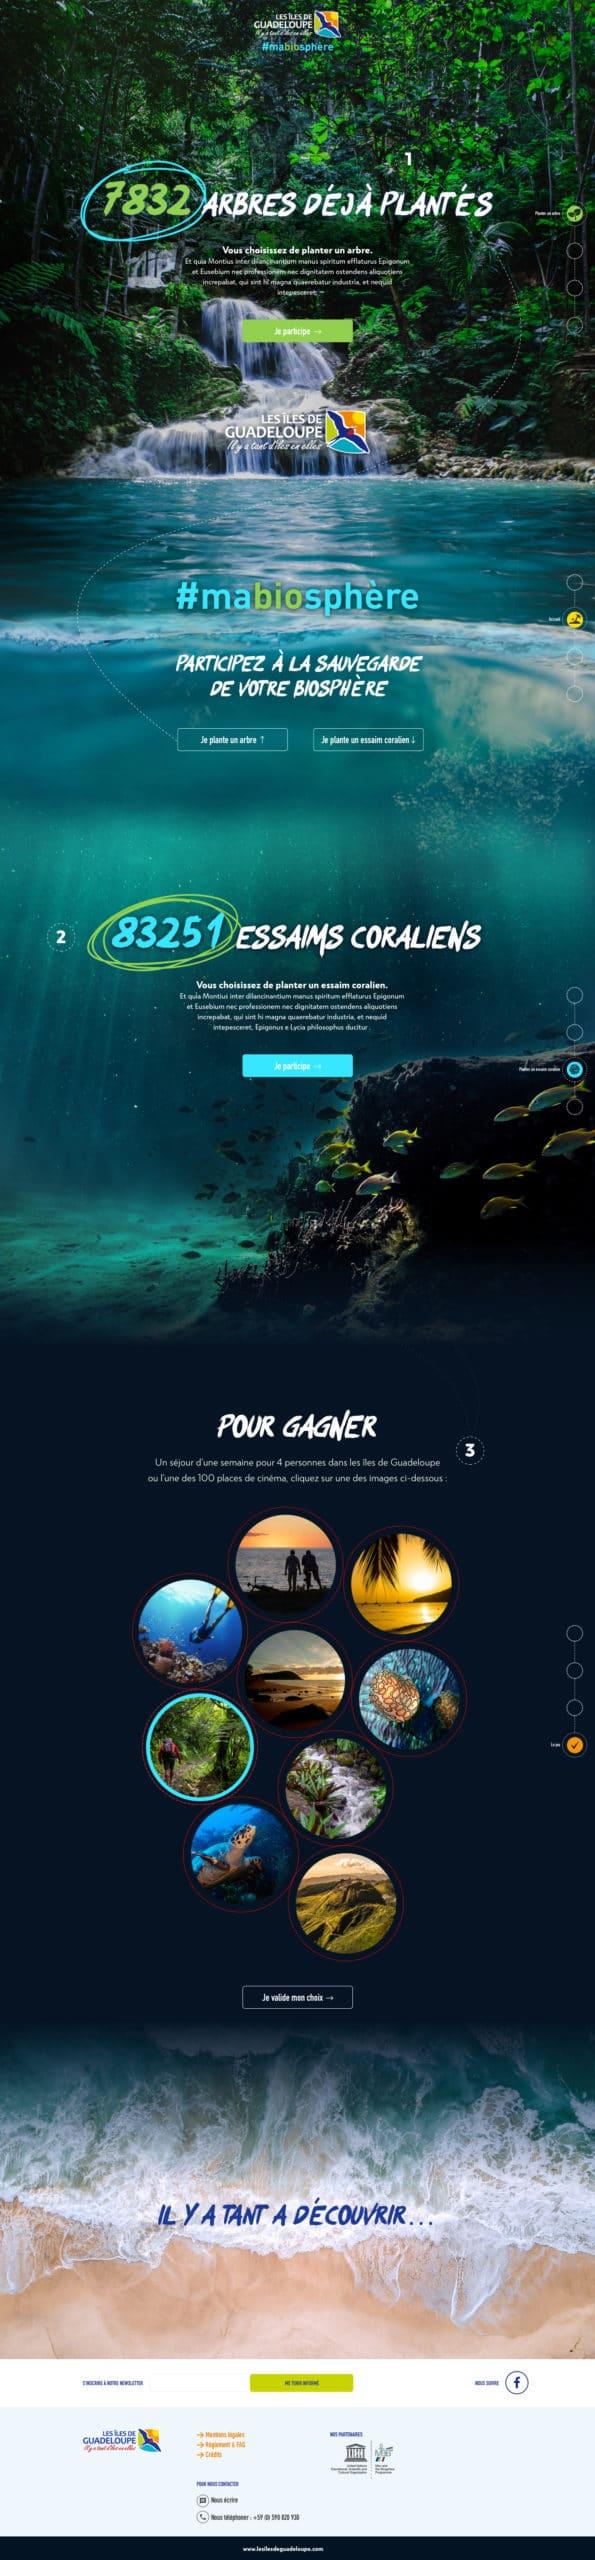 ctig webdesign